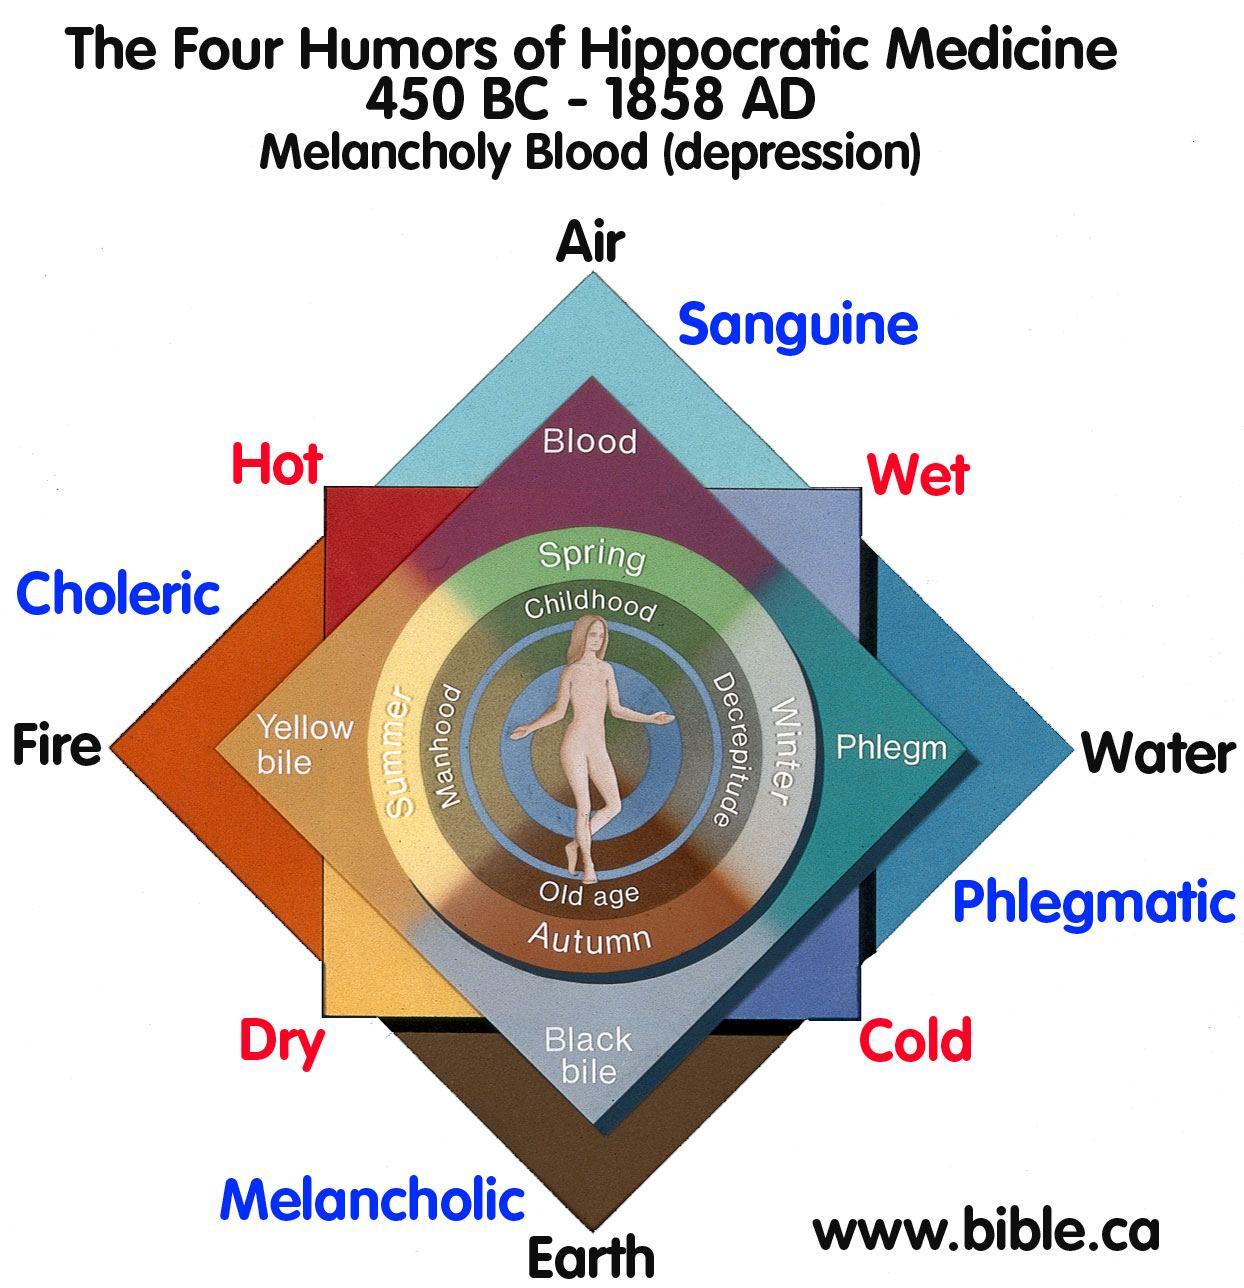 psychiatry-humoral-hippocratic-medicine-hippocrates-four-humors-450bc-1858ad-melanchol-blood-depression